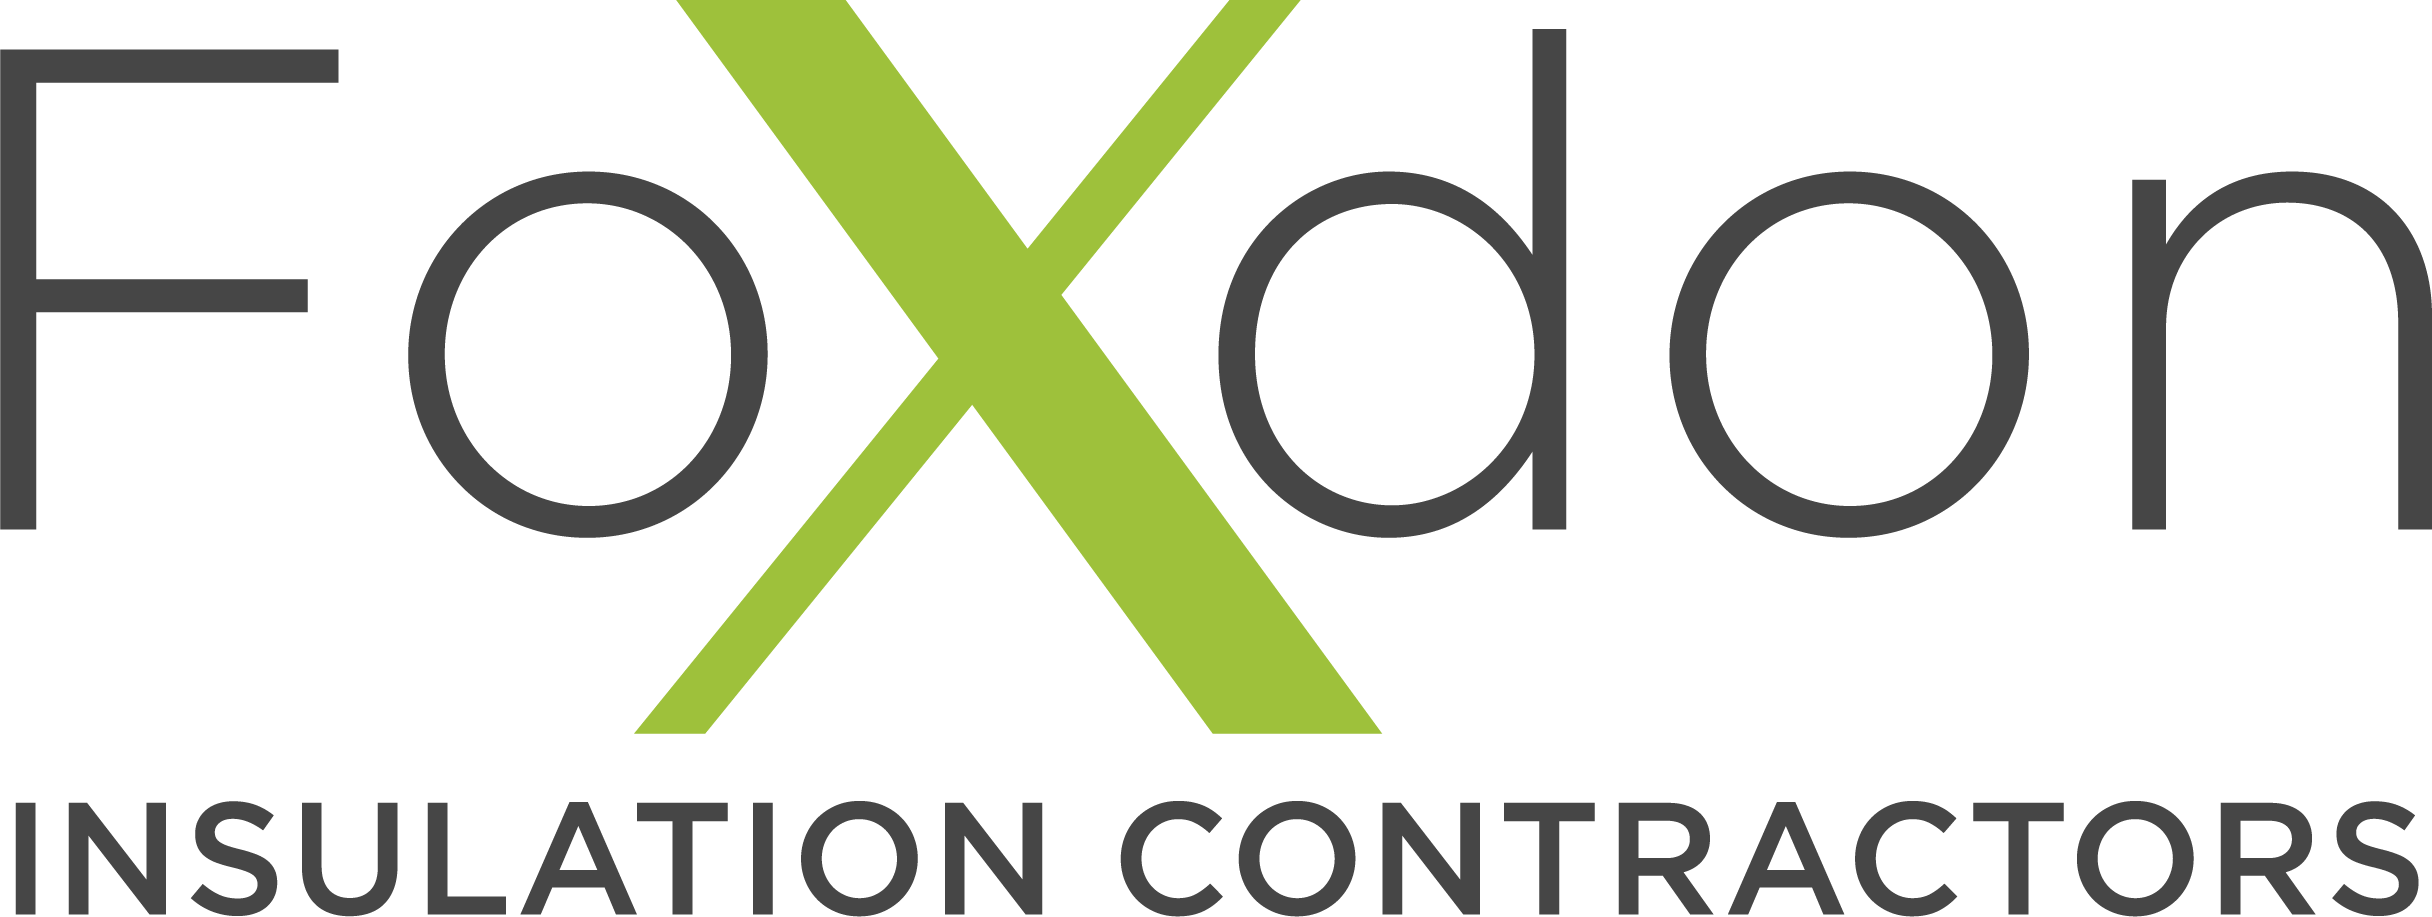 Foxdon Insulation Contractors